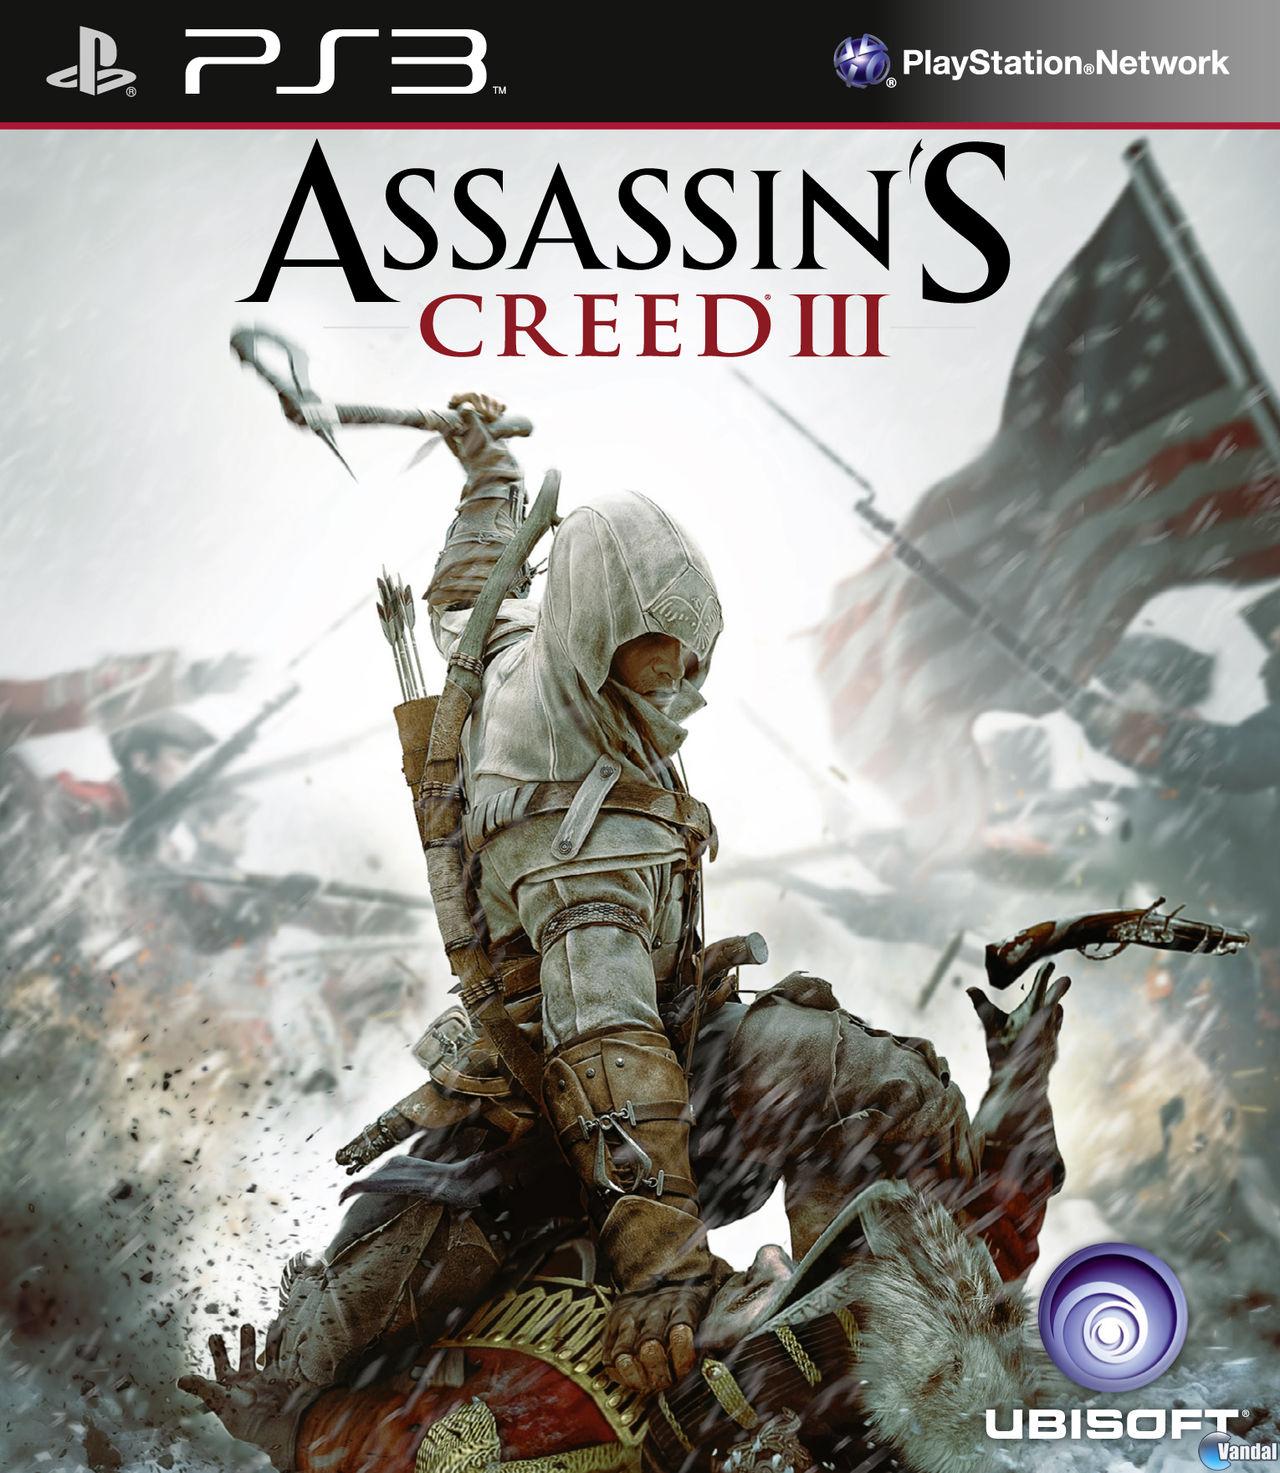 Assassin S Creed Iii Toda La Informacion Ps3 Xbox 360 Pc Wii U